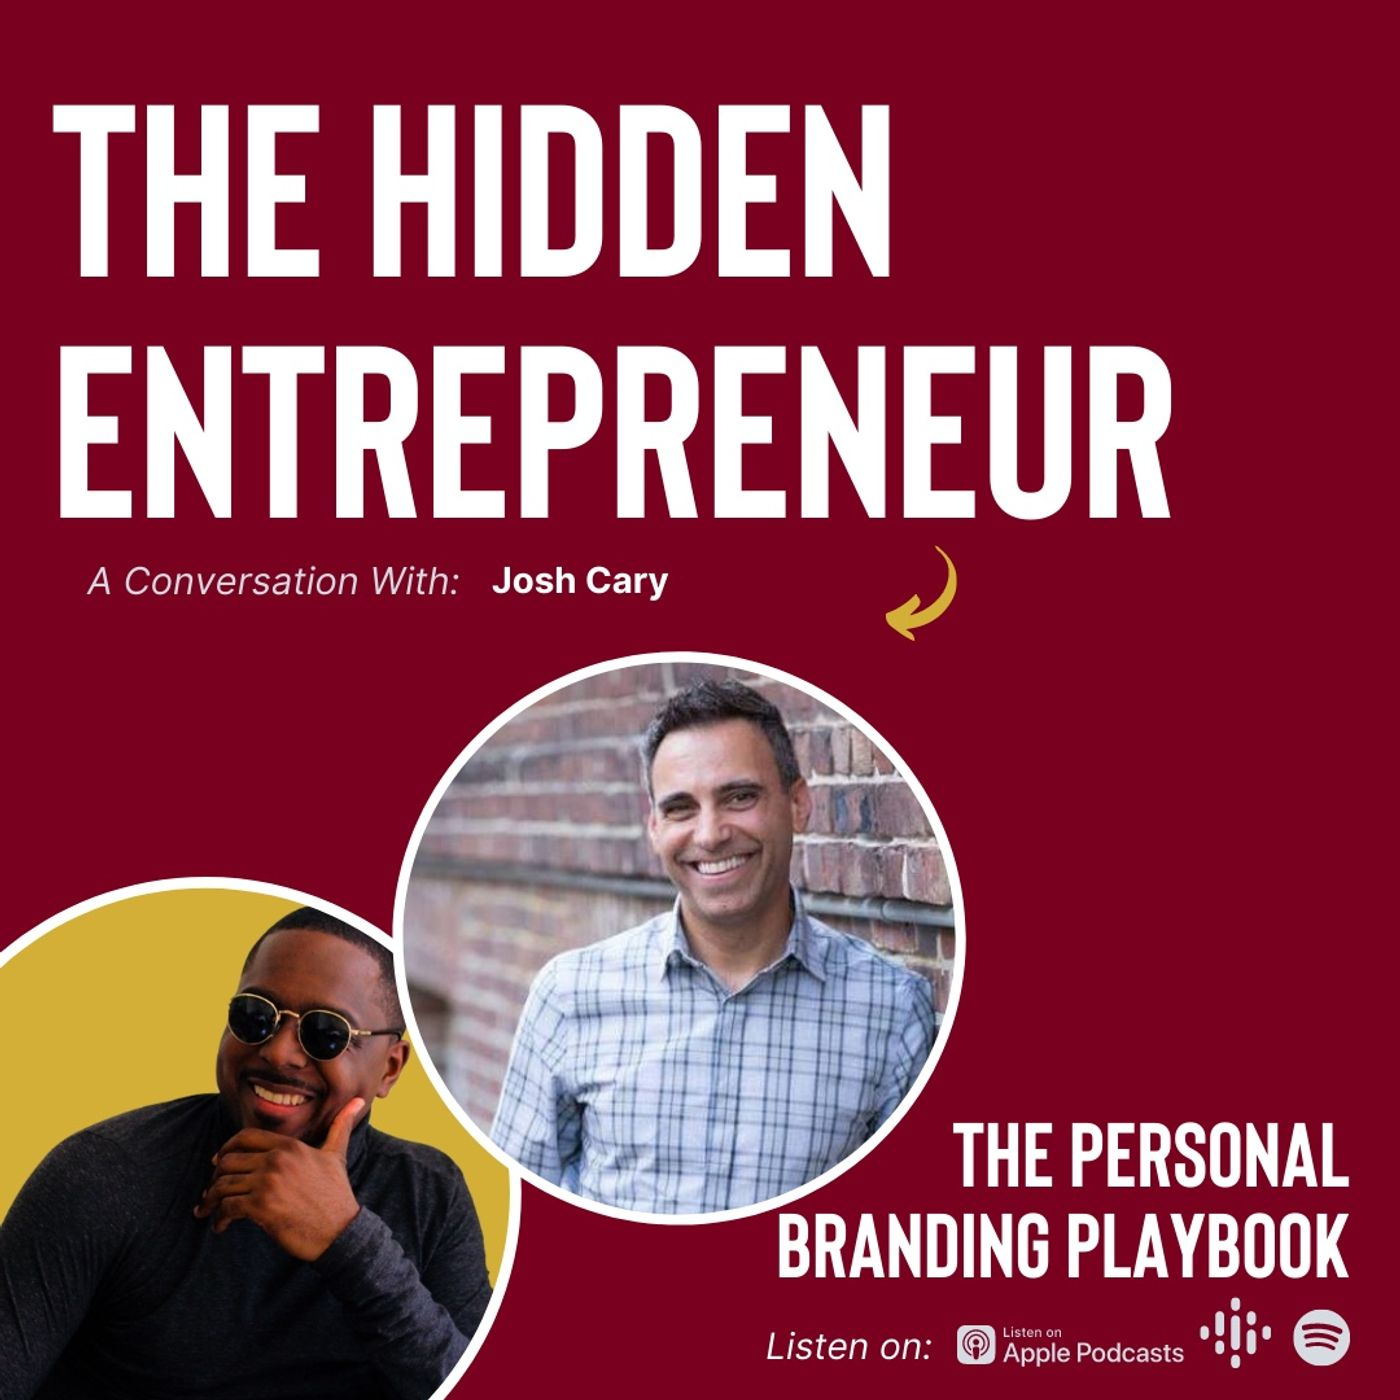 The Hidden Entrepreneur ft. Josh Cary